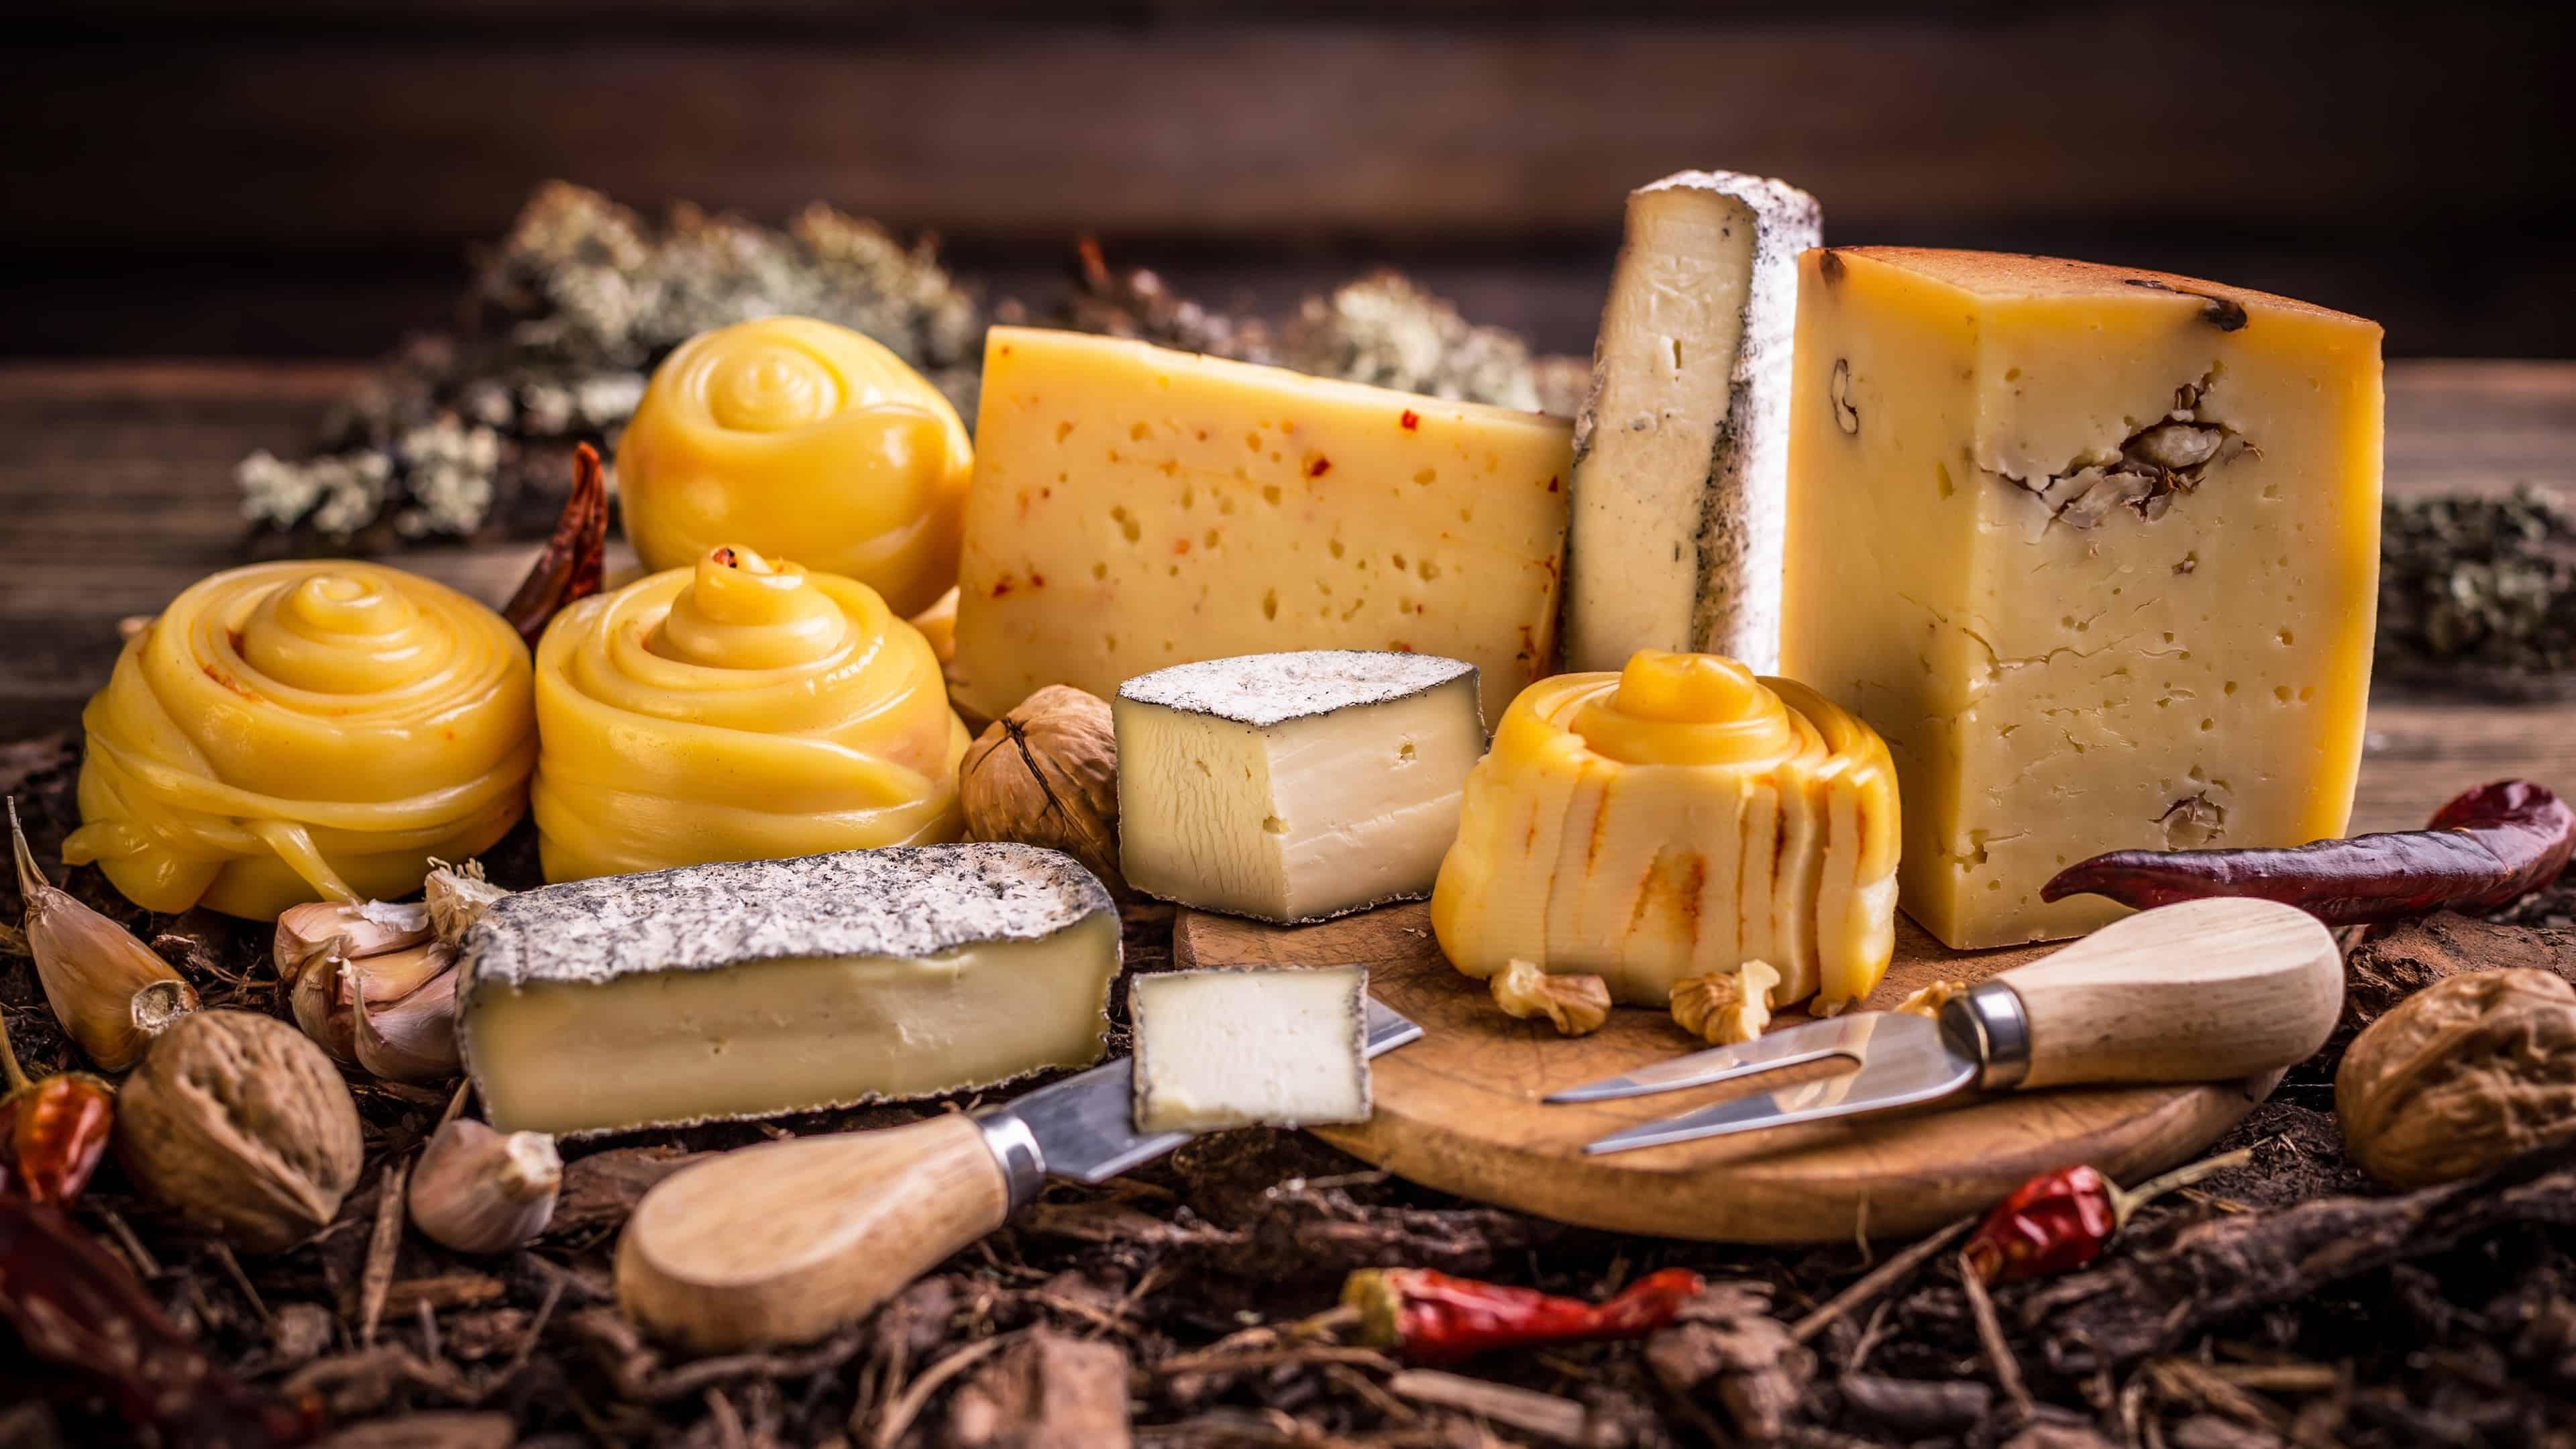 Cheese Platter Uhd 4k Wallpaper Pixelz